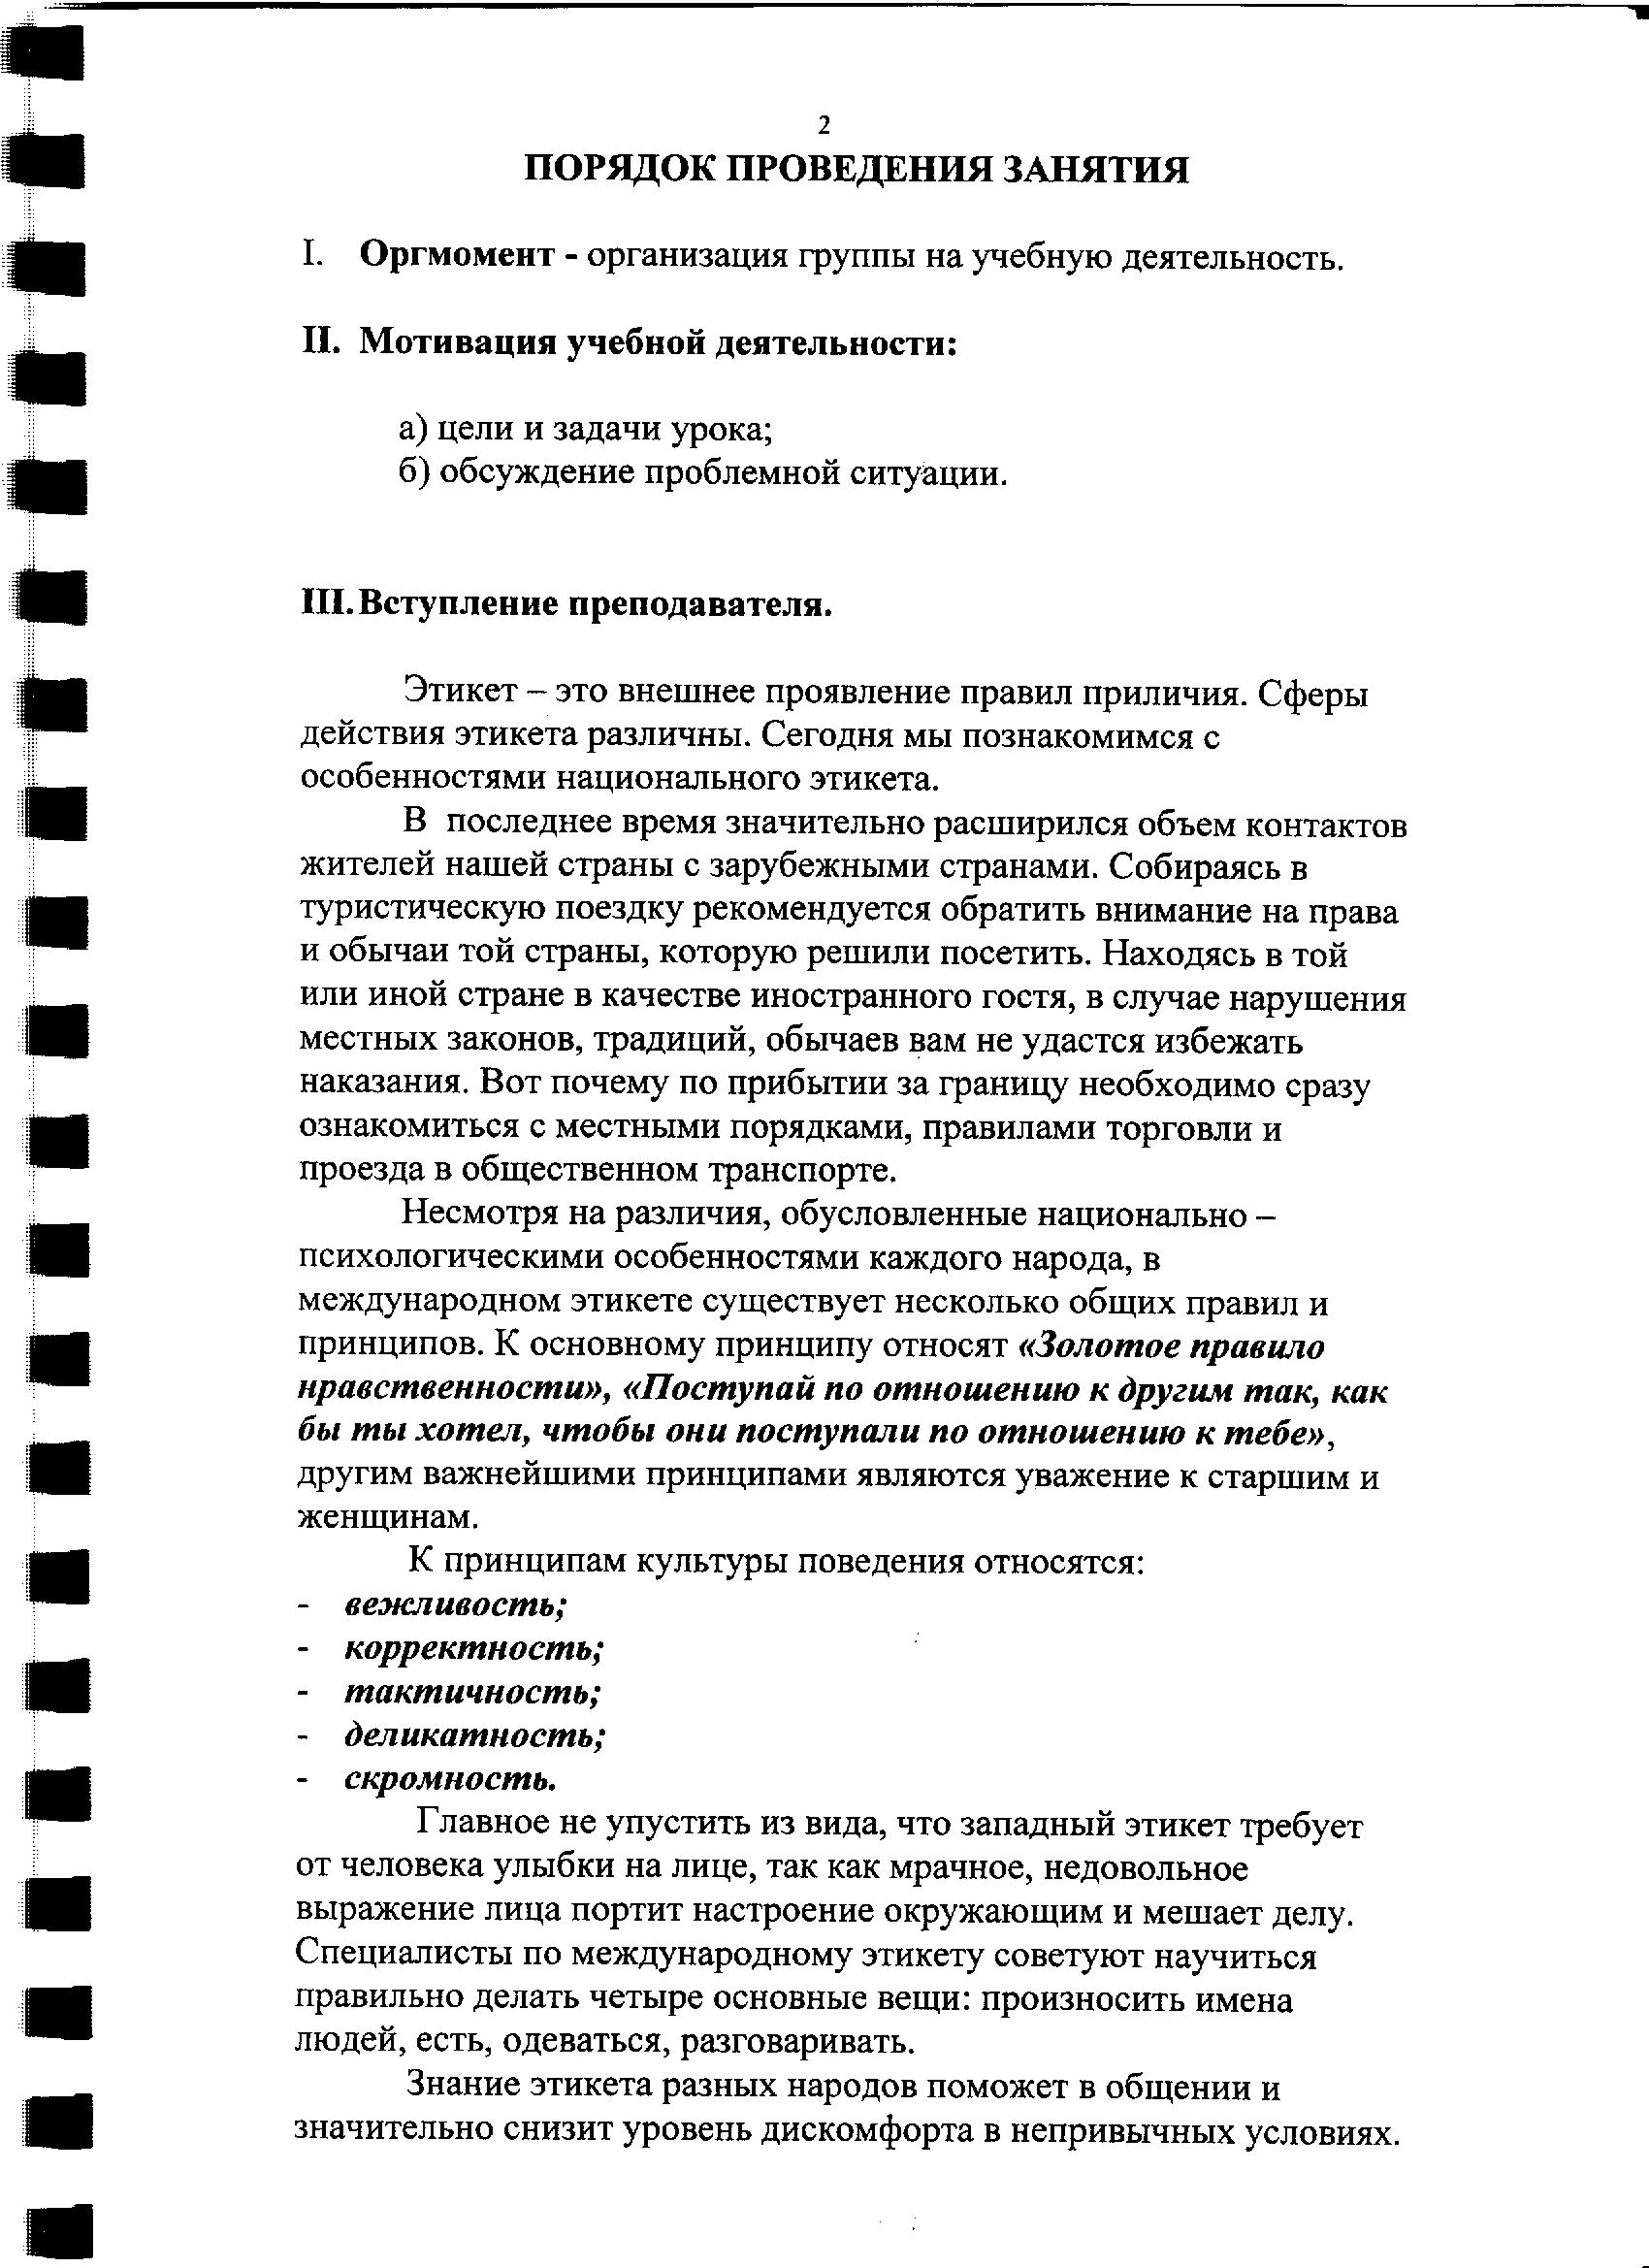 C:\Documents and Settings\Николай\Мои документы\Мои рисунки\Урок путешествие3.bmp